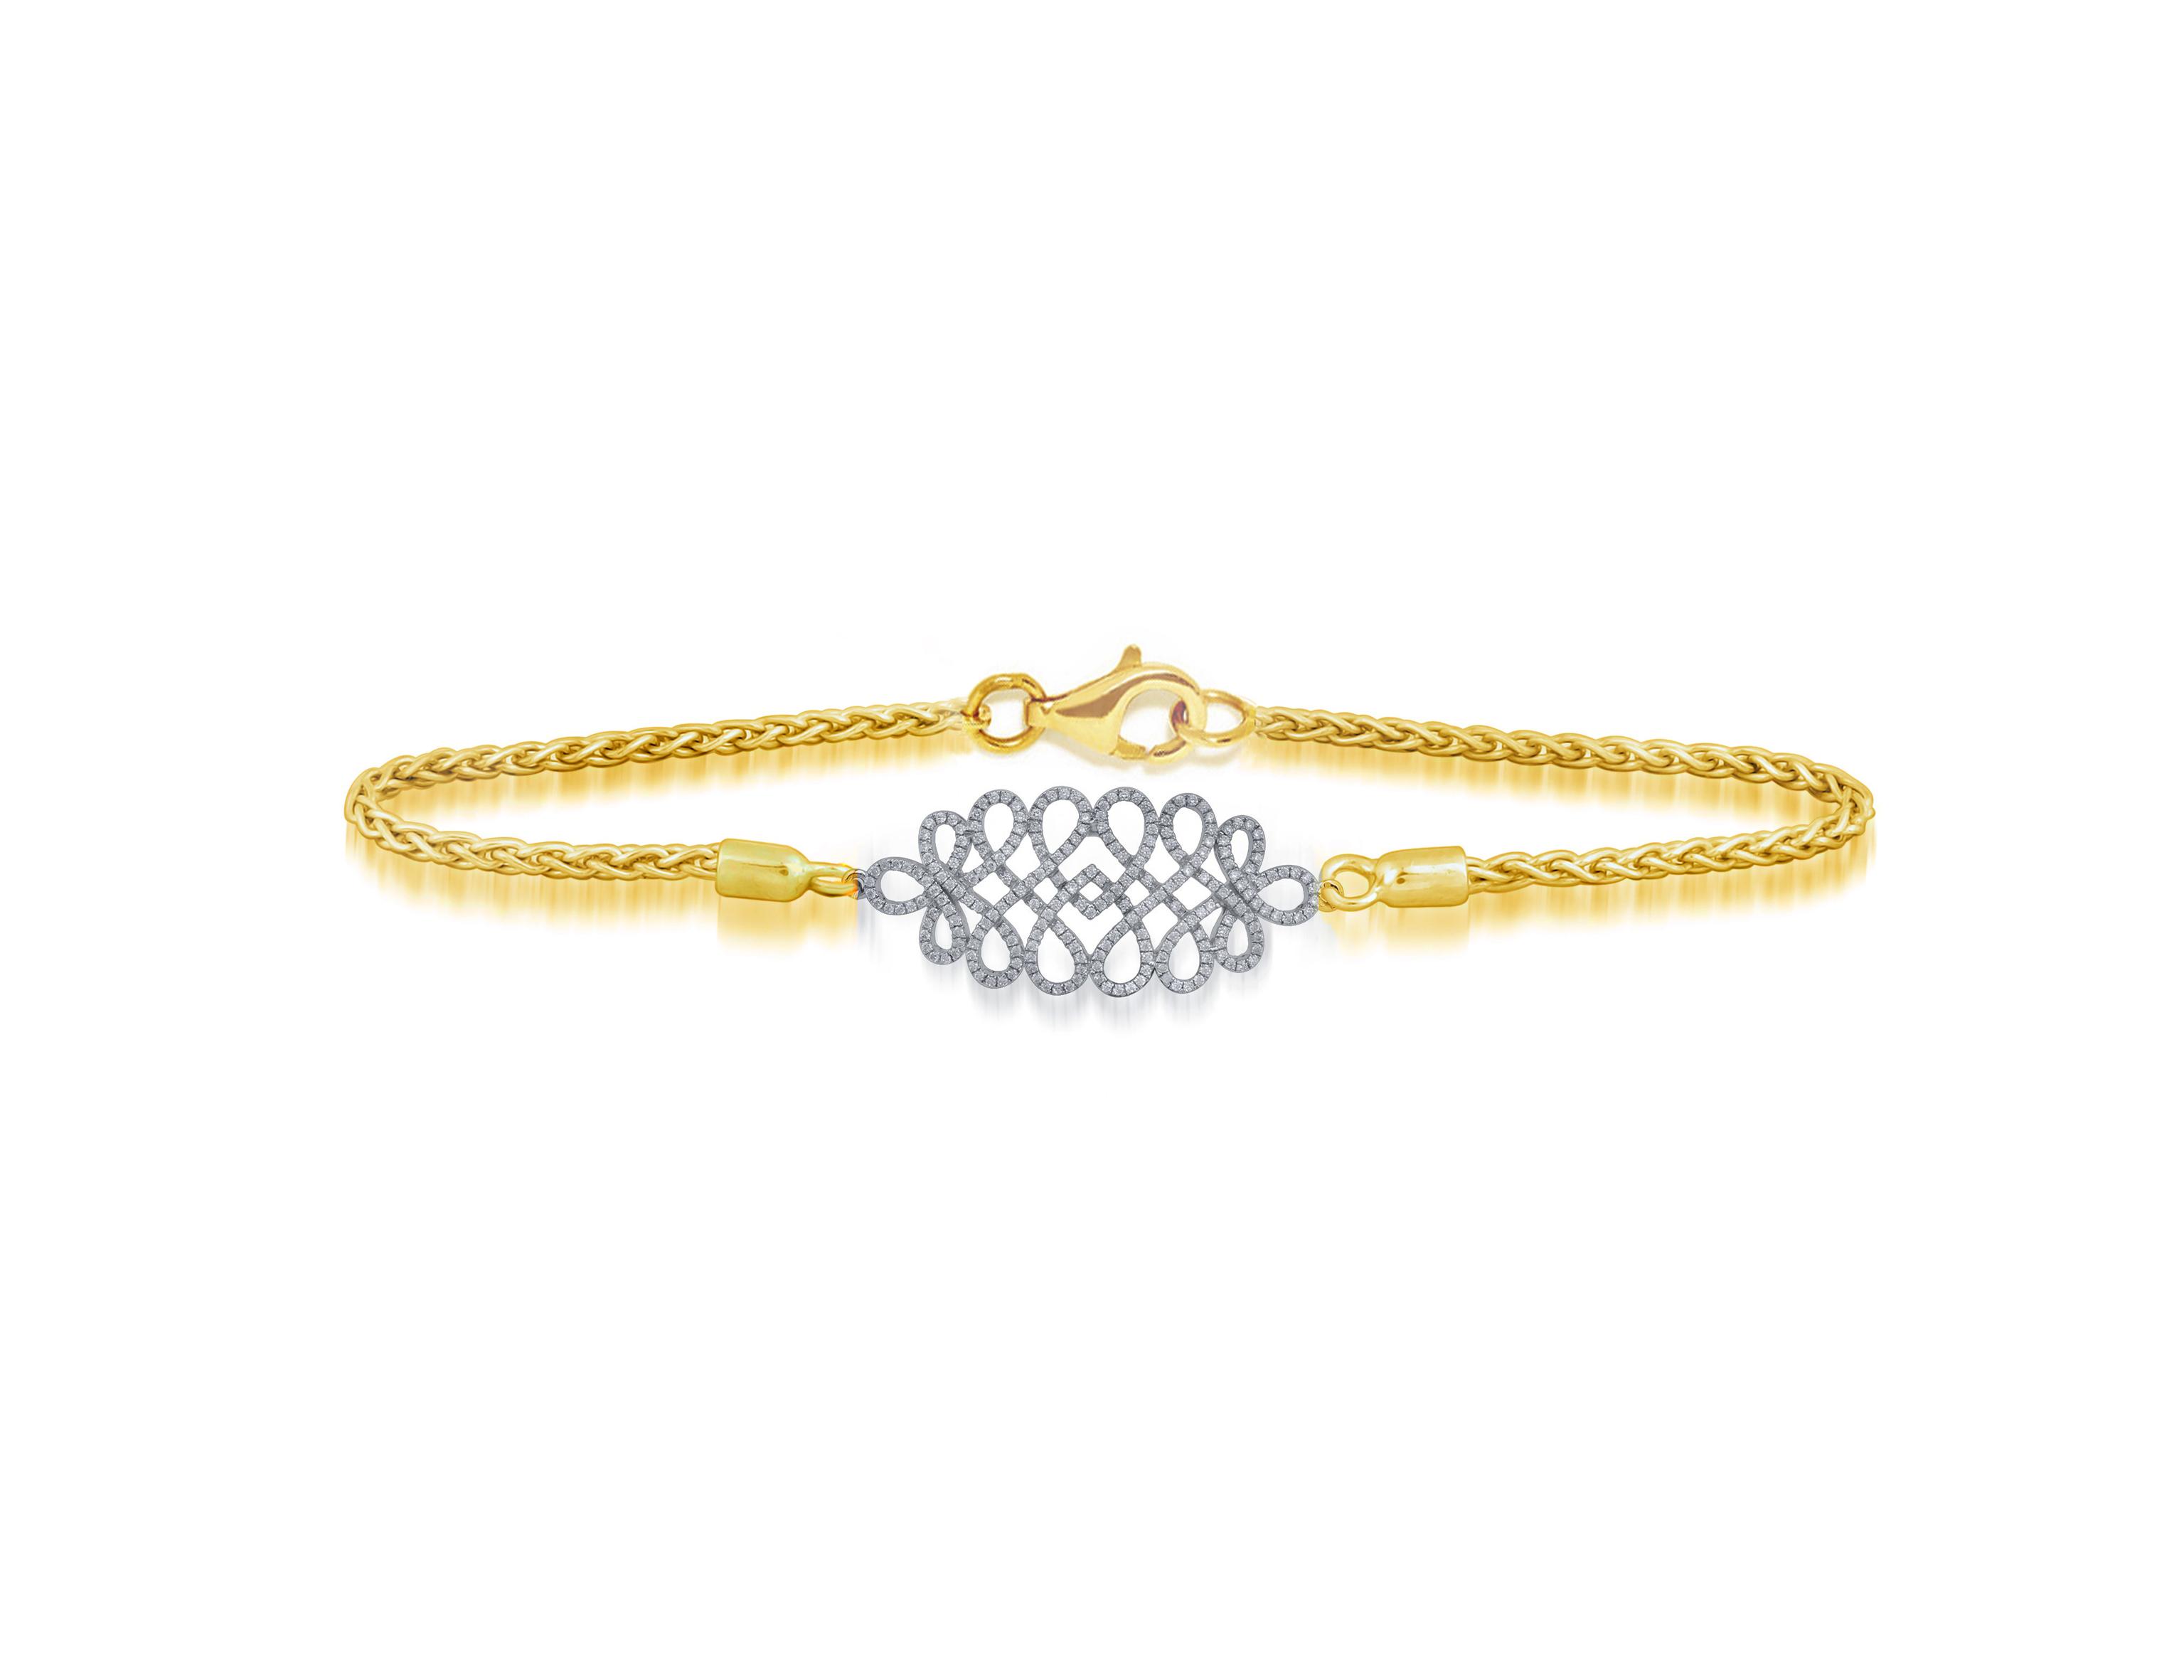 9k Yellow And White Gold Brilliant Cut Diamond & Chain Bracelet